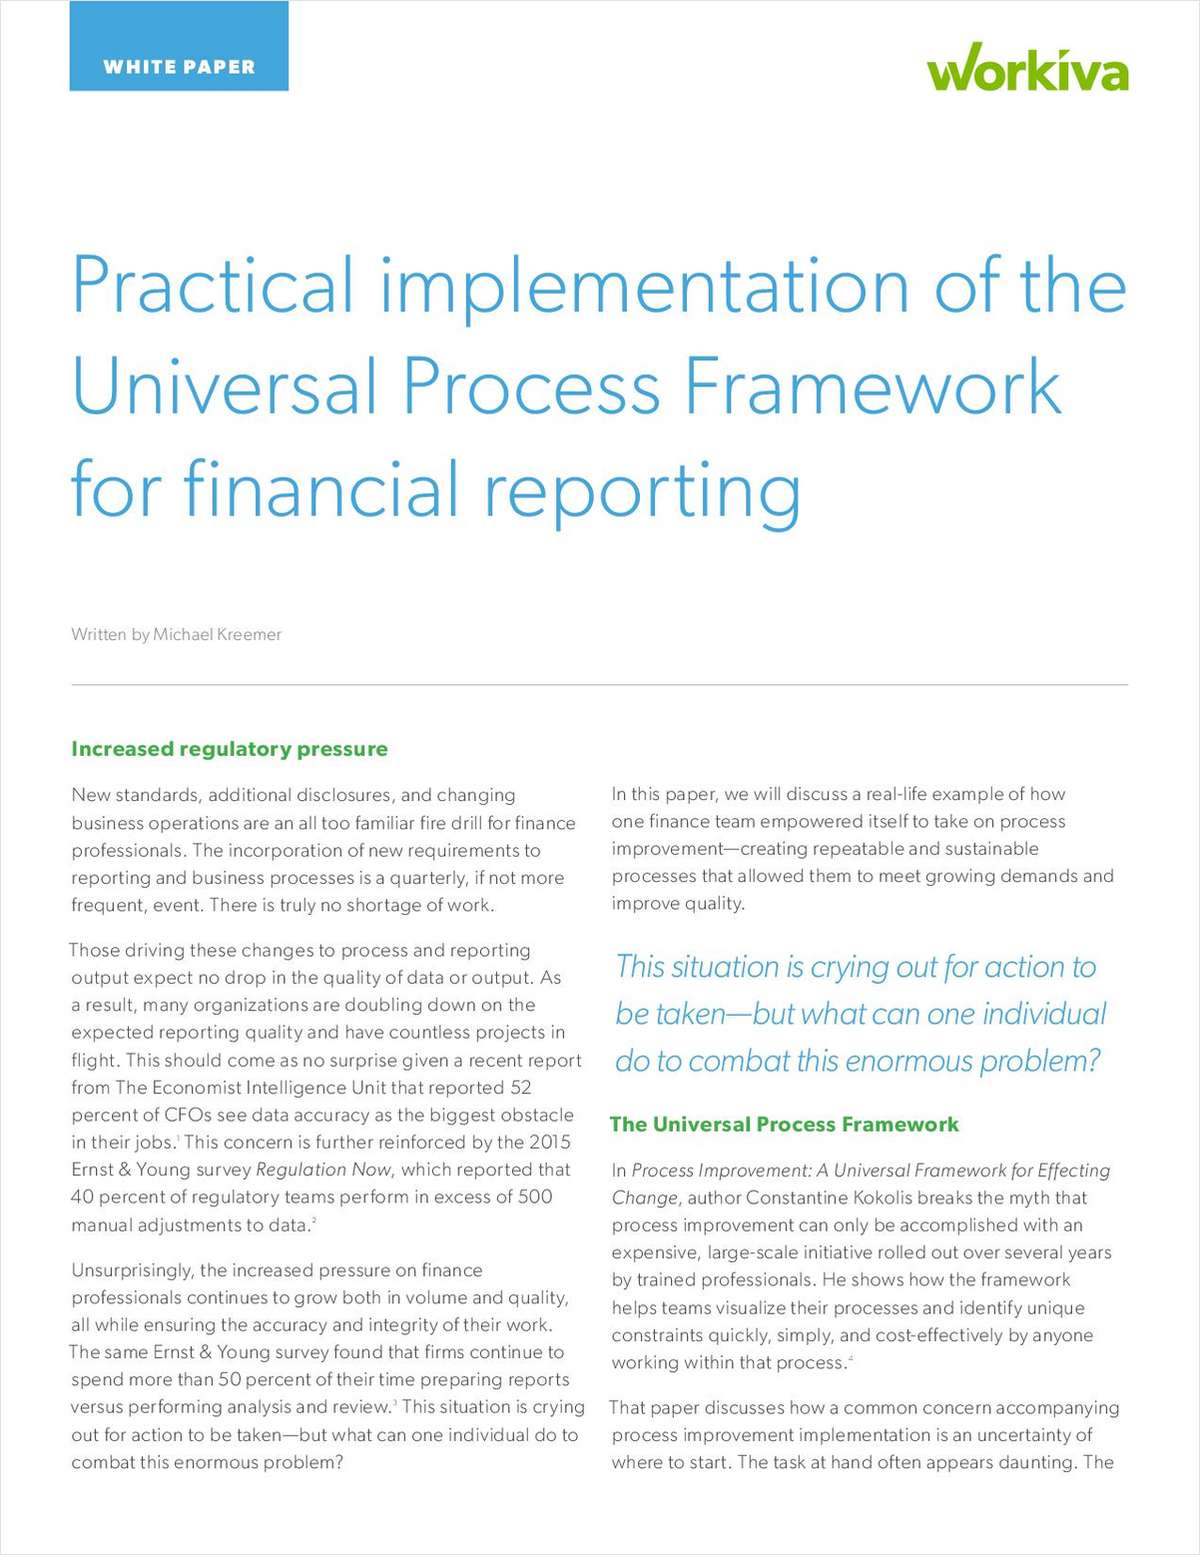 Process Improvement: A Practical Application of the Universal Framework